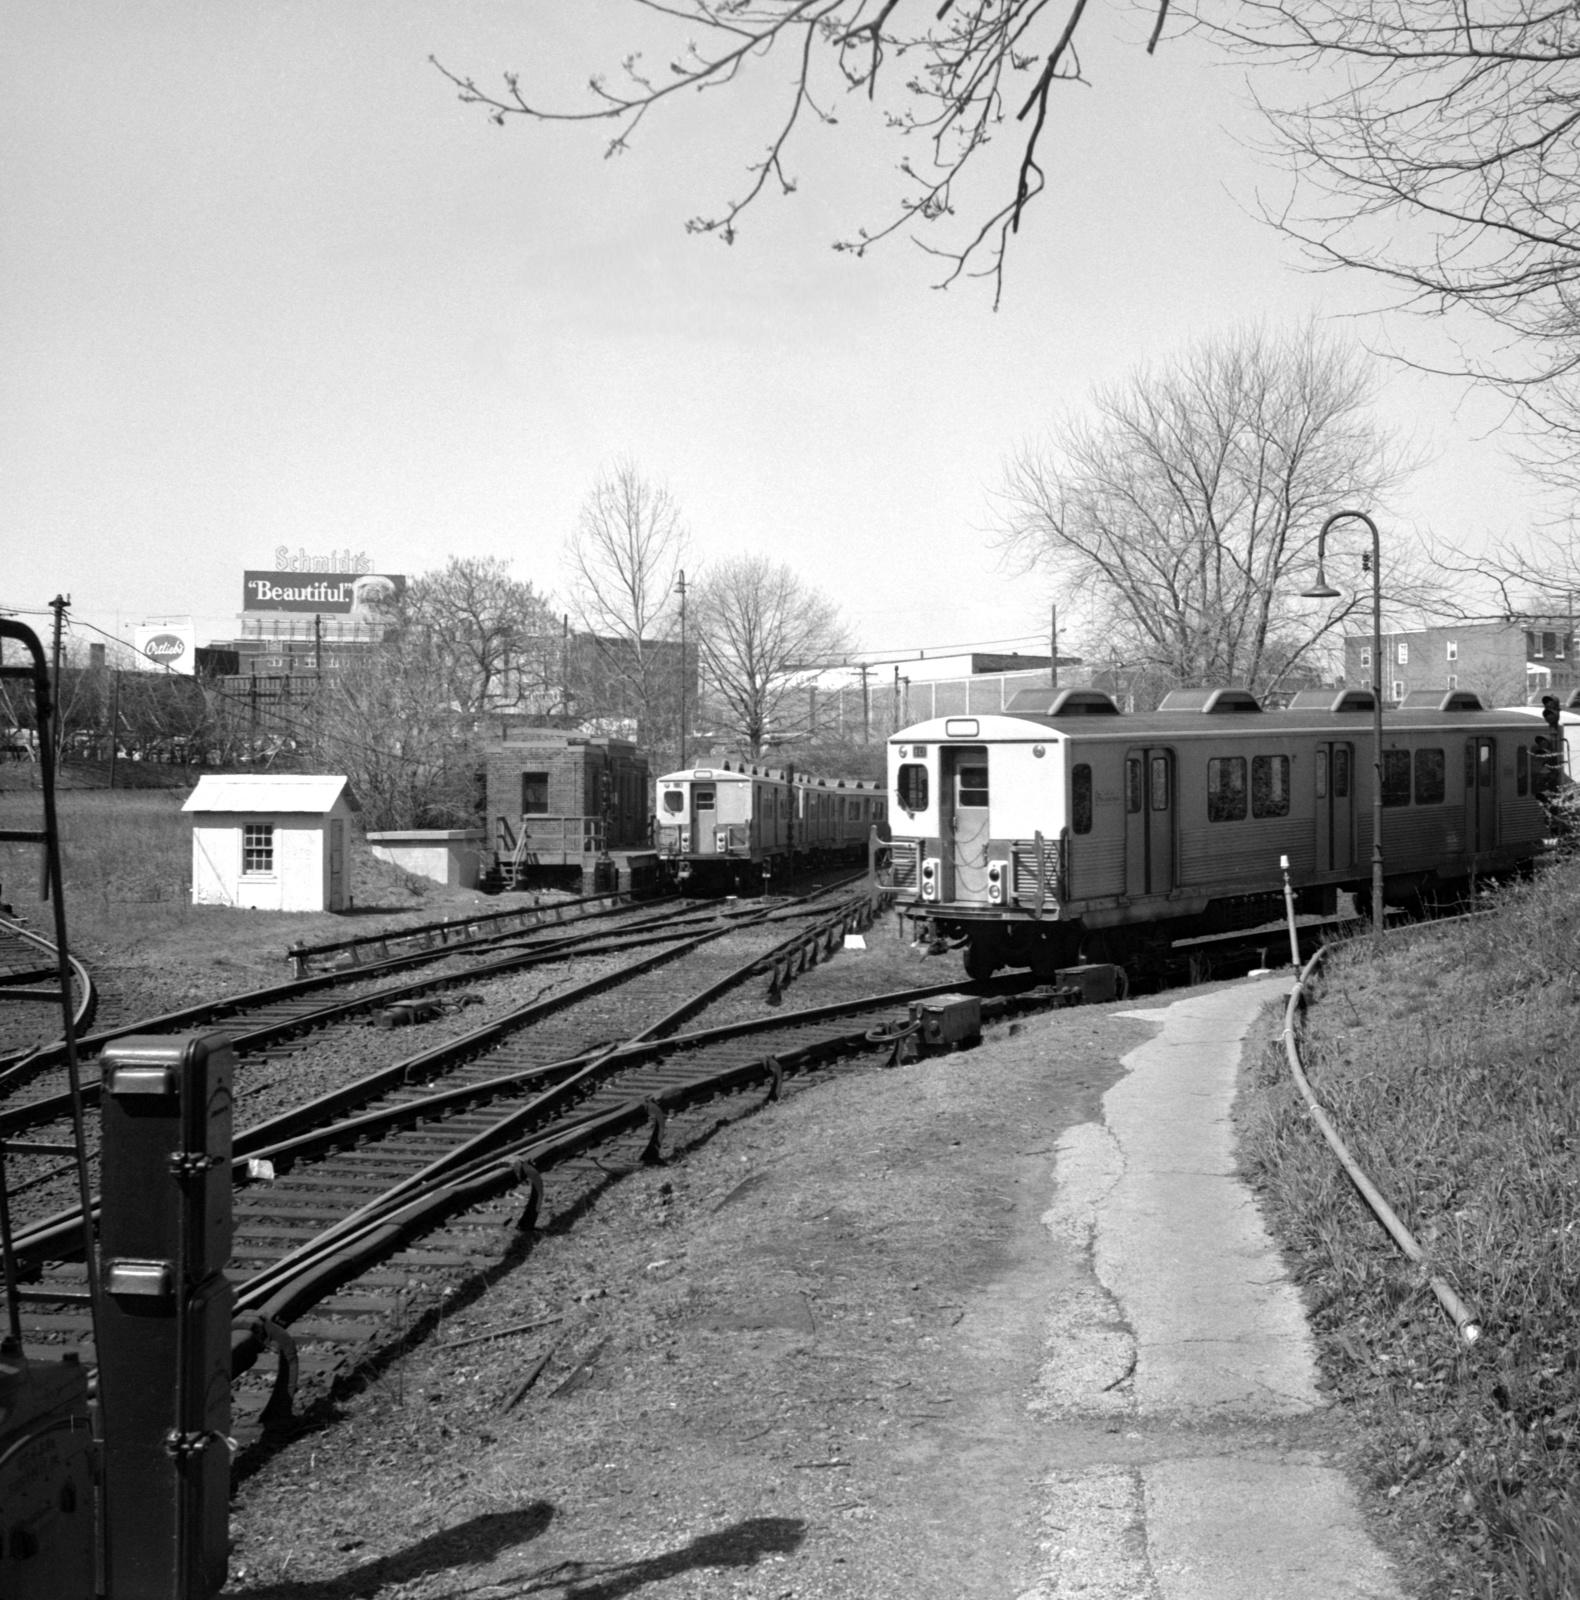 (844k, 1580x1600)<br><b>Country:</b> United States<br><b>City:</b> Philadelphia, PA<br><b>System:</b> SEPTA (or Predecessor)<br><b>Line:</b> Market-Frankford El<br><b>Location:</b> 69th Street<br><b>Car:</b> SEPTA M-3 (Budd, 1960)  <br><b>Collection of:</b> David Pirmann<br><b>Date:</b> 4/18/1970<br><b>Viewed (this week/total):</b> 2 / 55